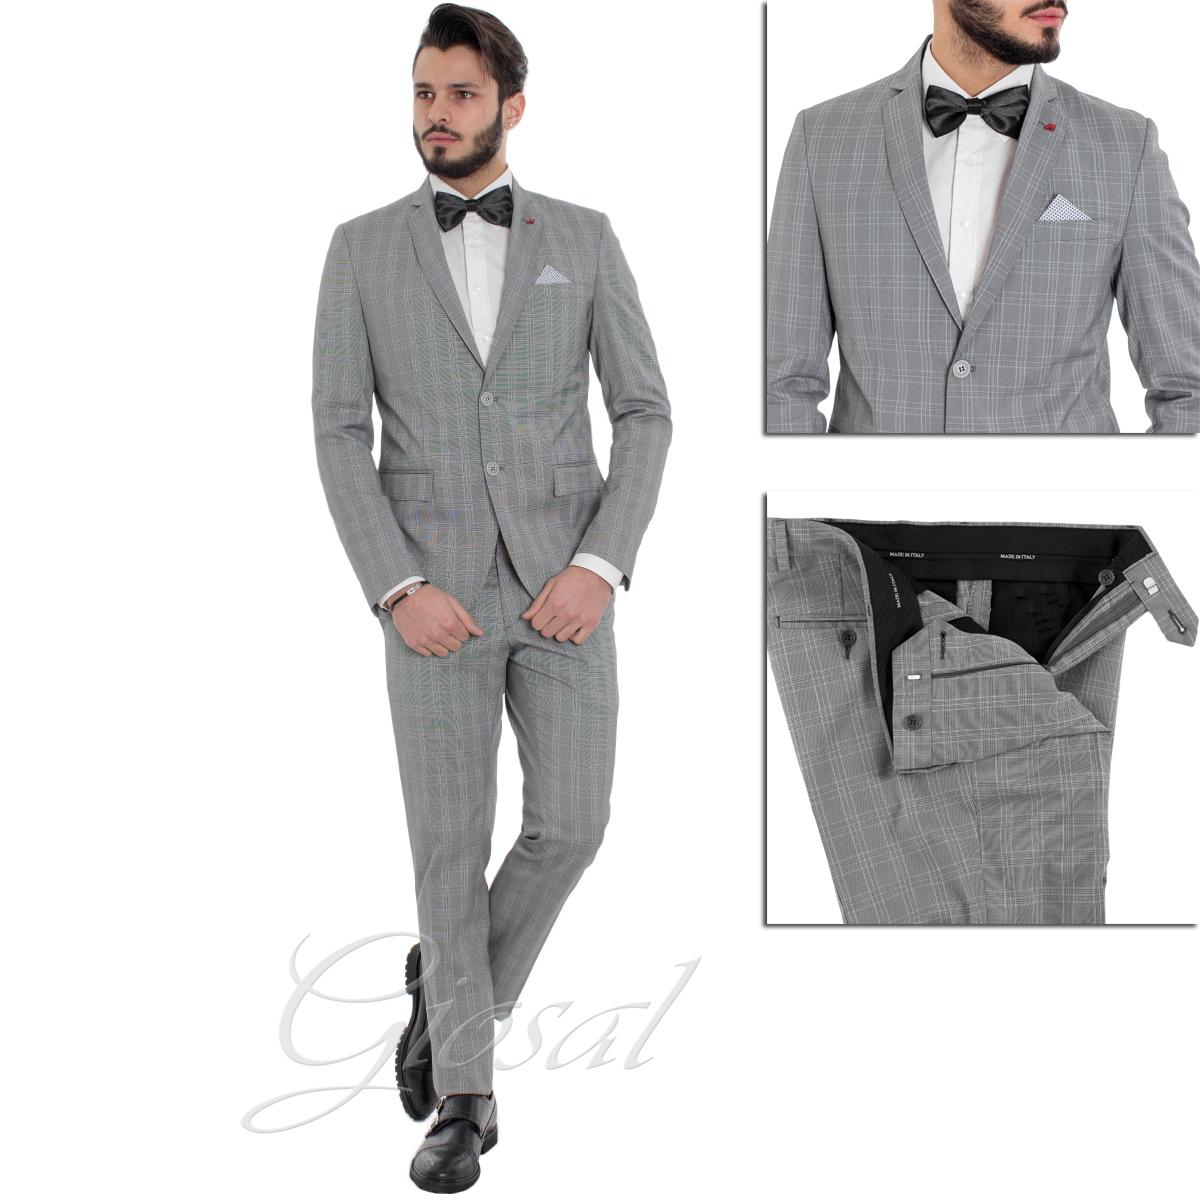 Vestiti Eleganti Uomo Grigio.Abito Elegante Uomo Grigio Scozzese Pochette Giacca Pantalone Slim